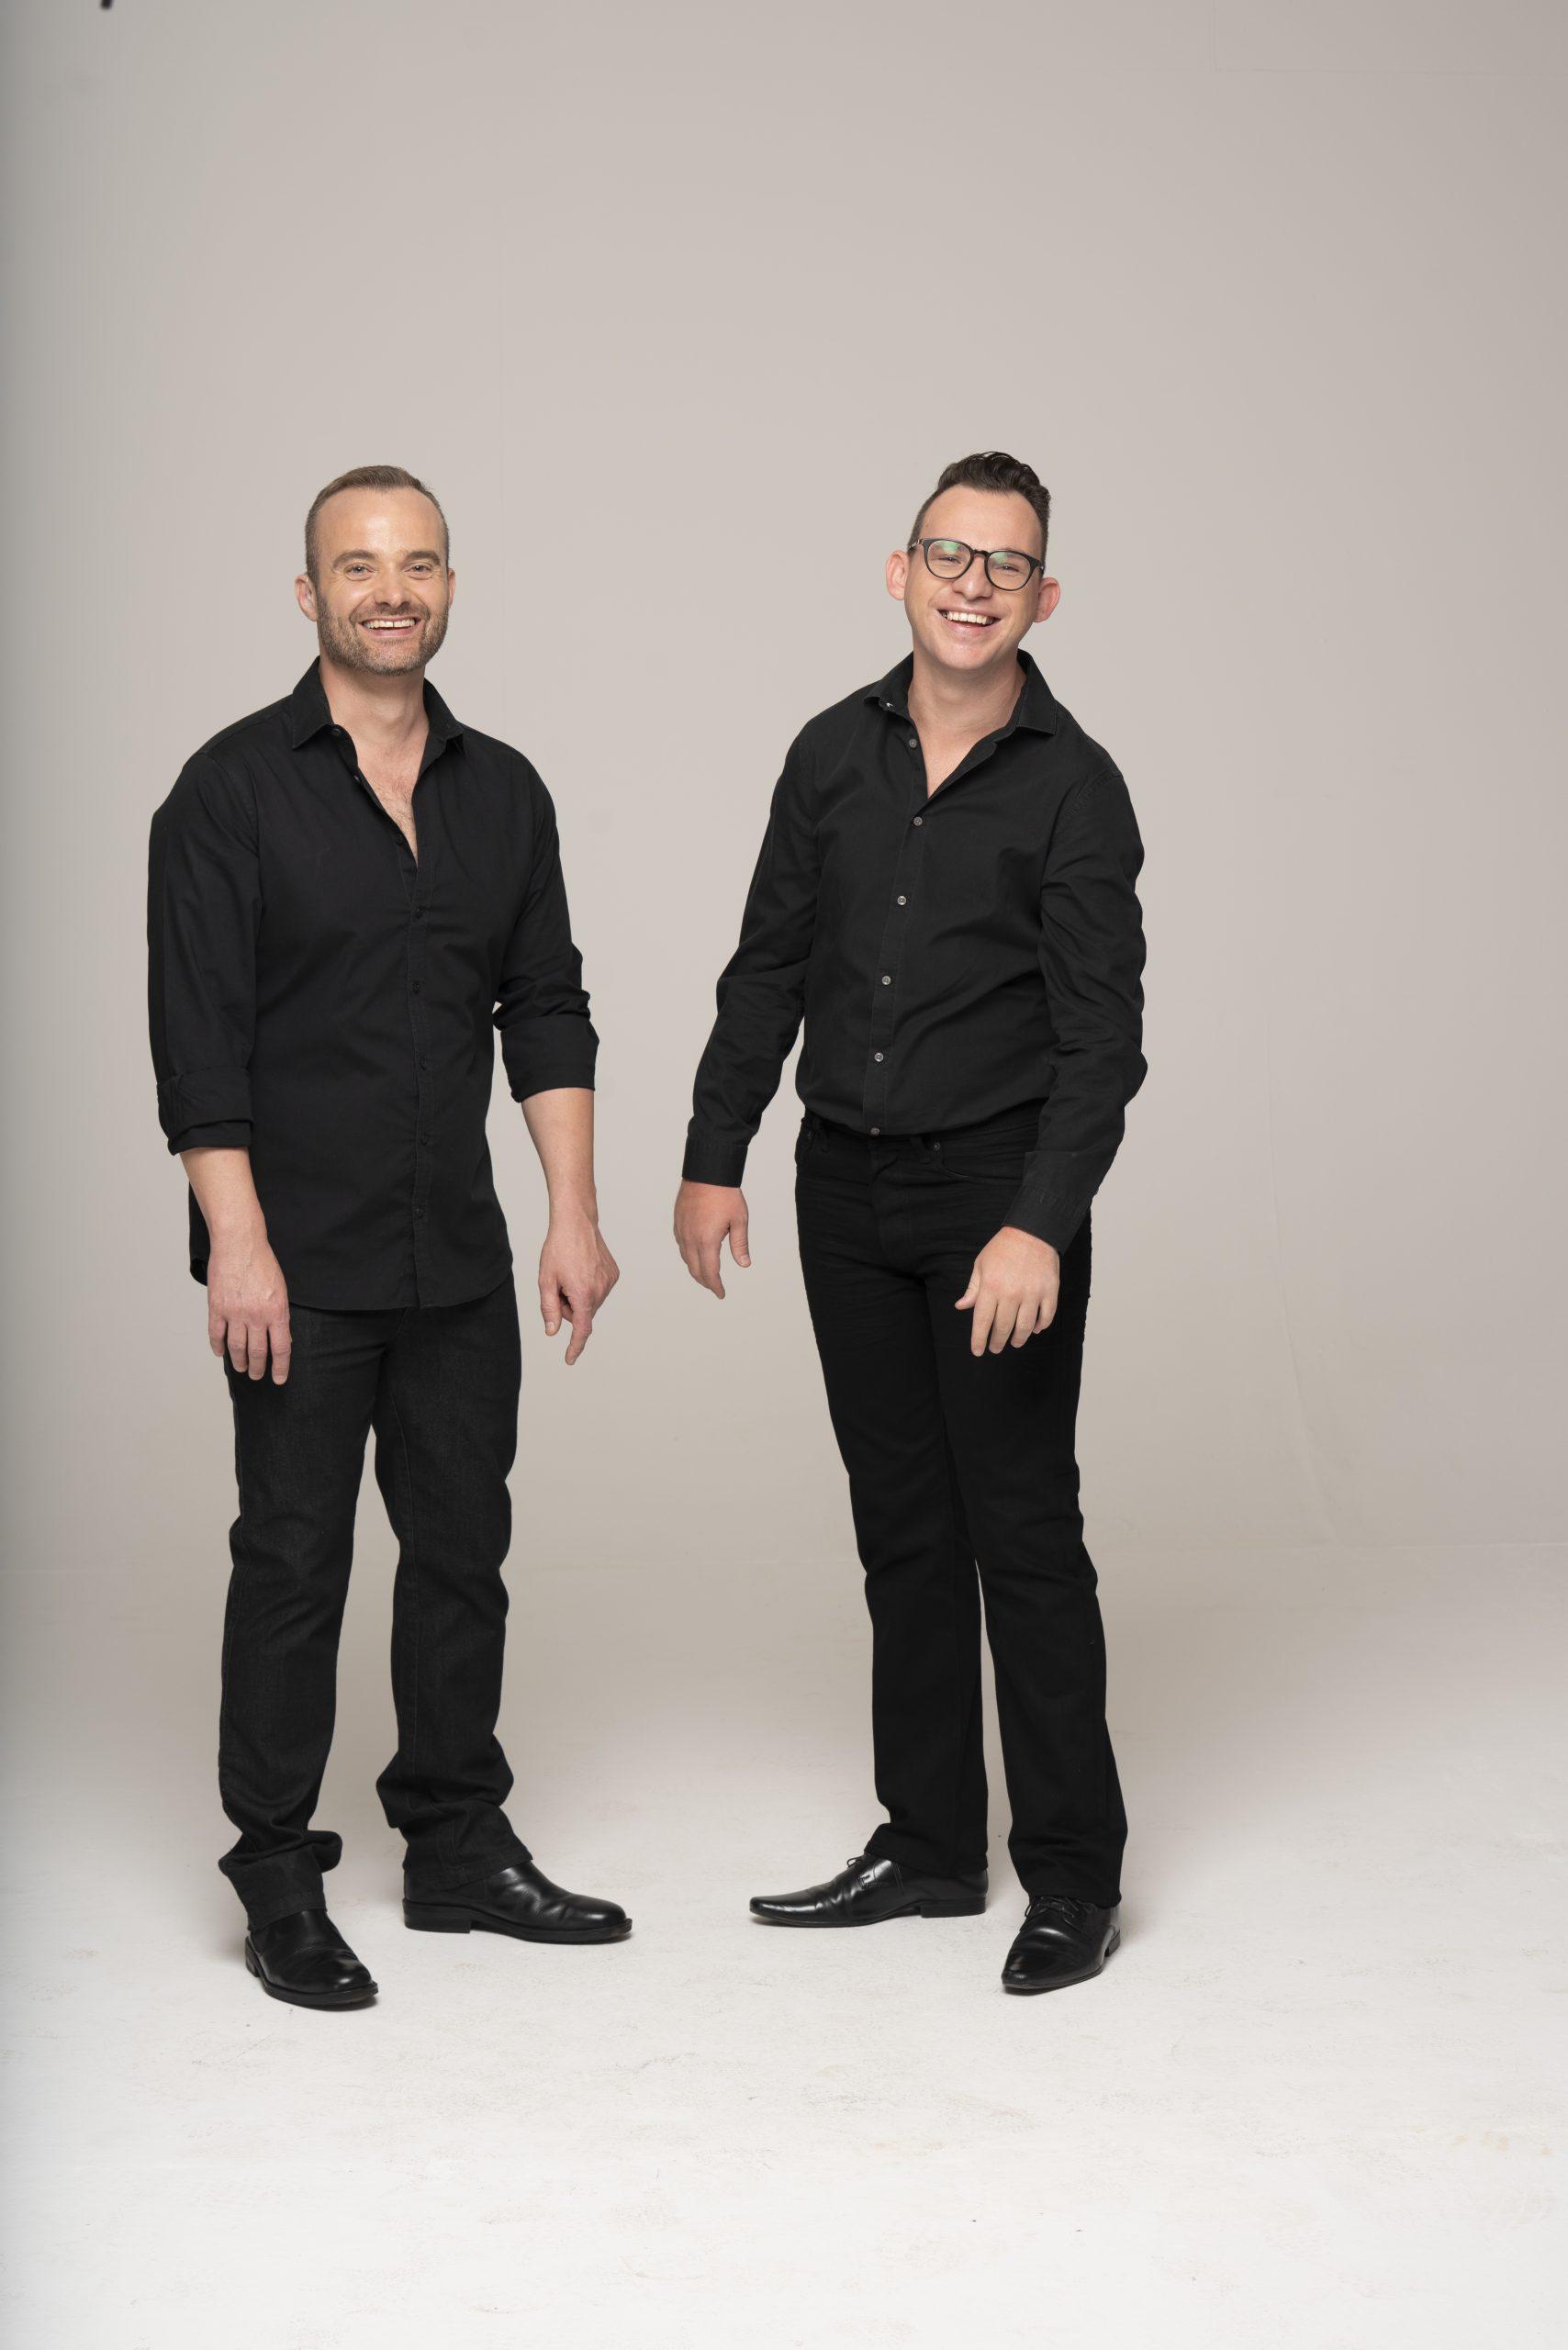 Richard and Hein Prinsloo Curson